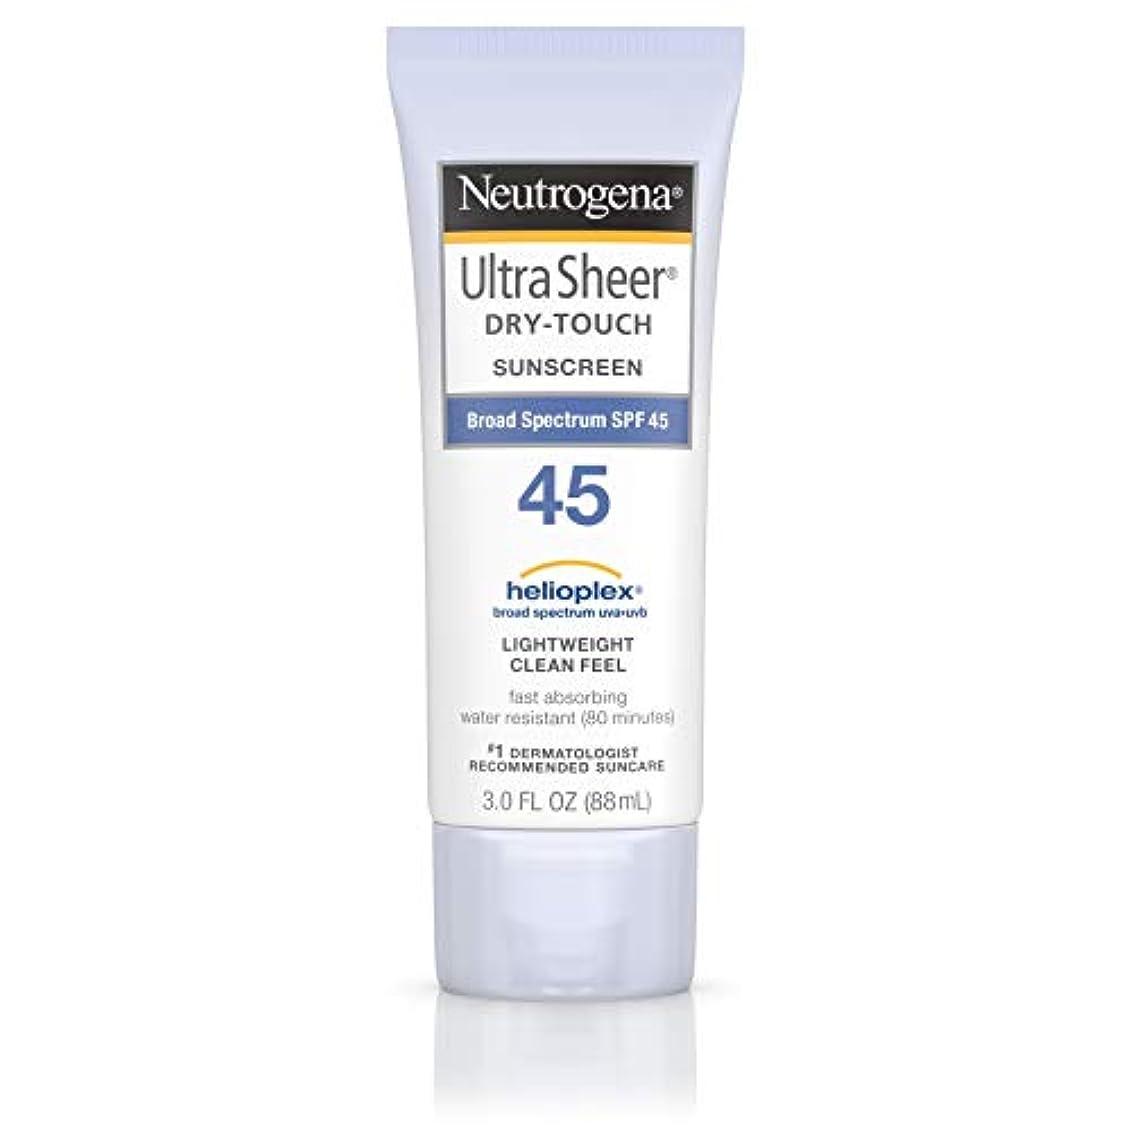 お客様初心者詐欺師海外直送品 Neutrogena Neutrogena Ultra Sheer Dry-Touch Sunblock Spf 45【並行輸入品】